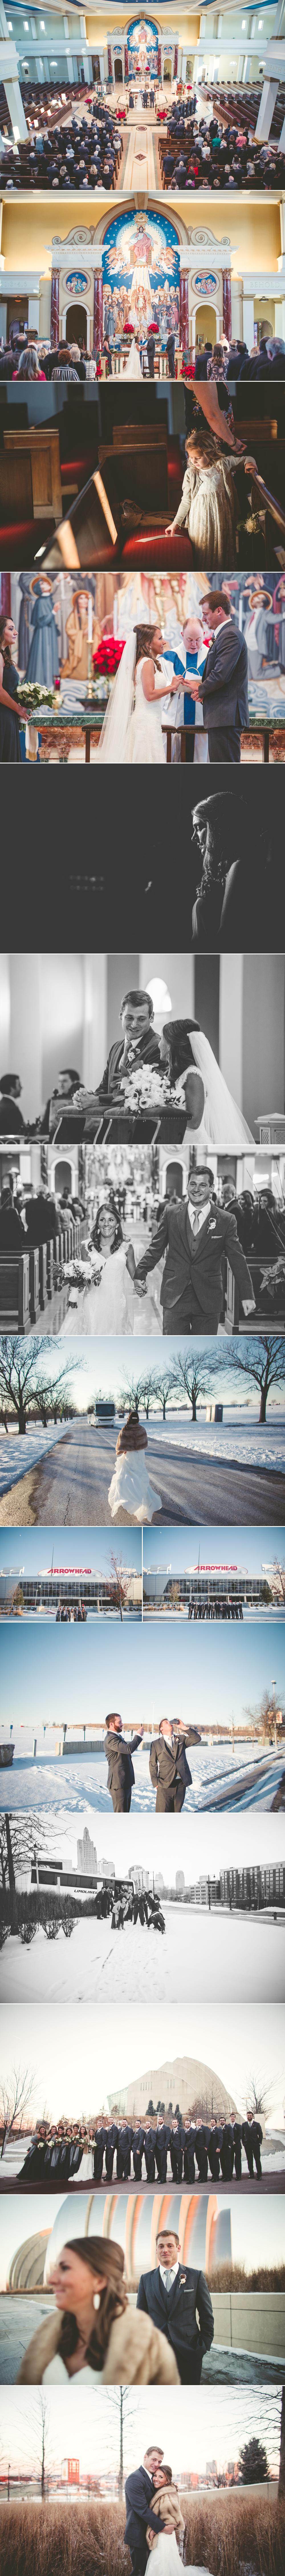 jason_domingues_photography_best_kansas_city_photographer_kc_wedding_weddings_winter0002